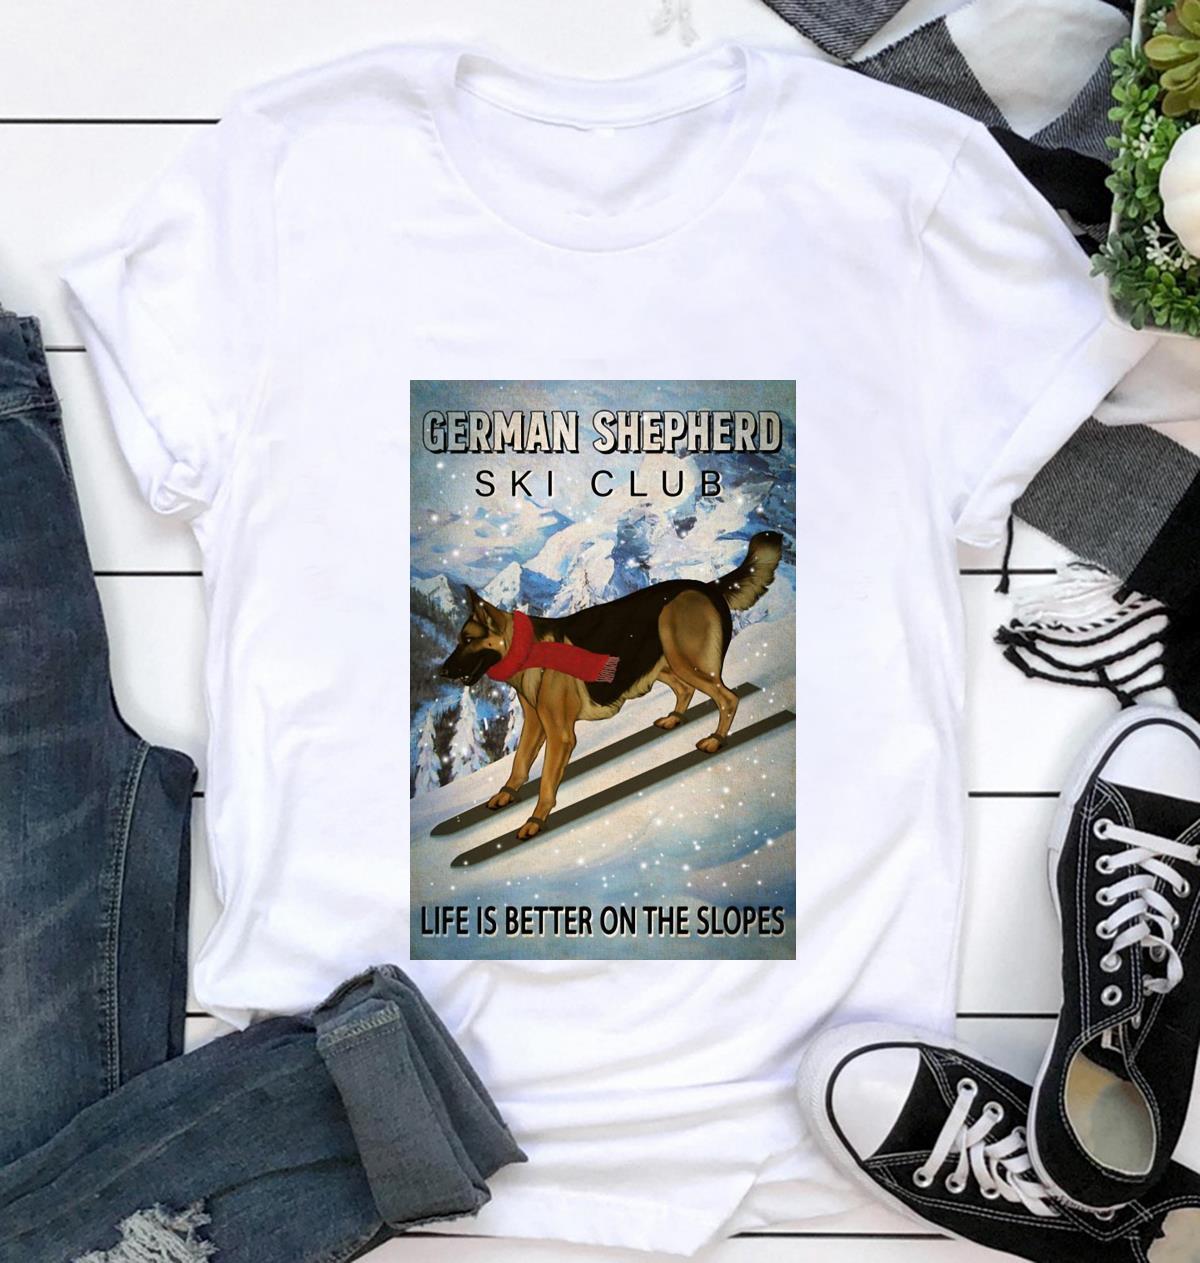 German Shepherd ski club life is better on the slopes poster t-shirt